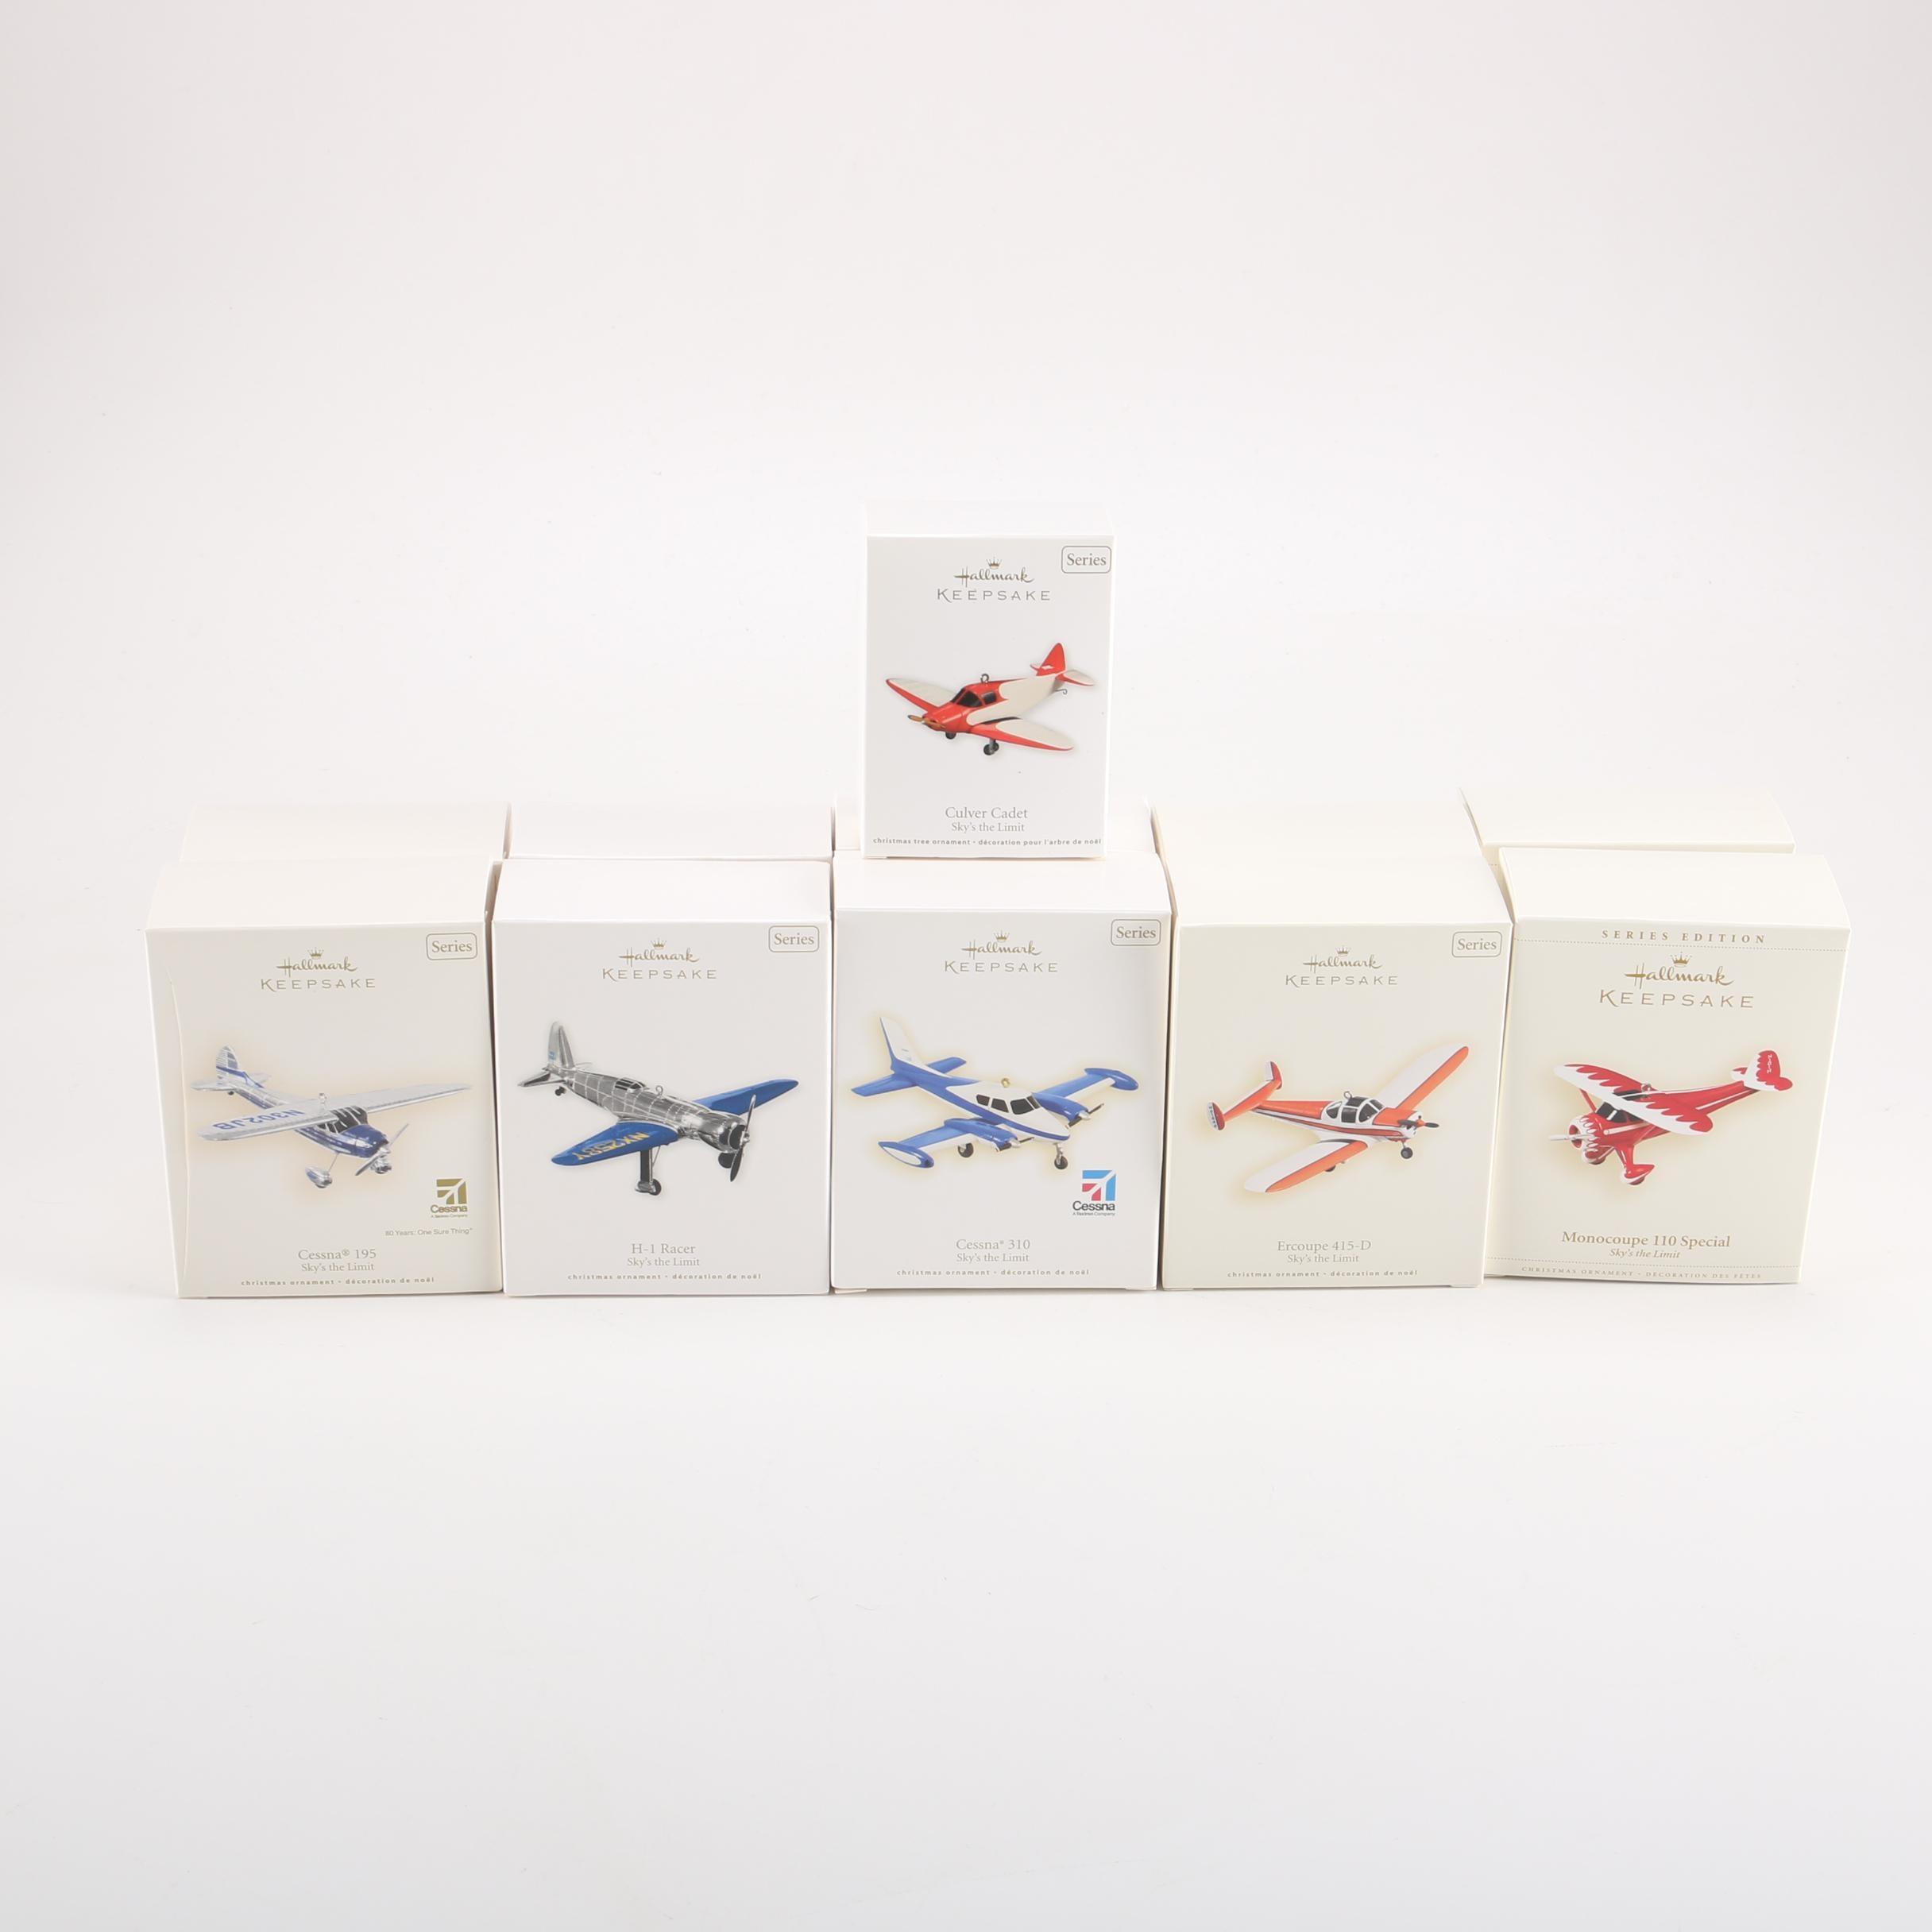 Hallmark Keepsake Die-Cast Airplane Ornaments